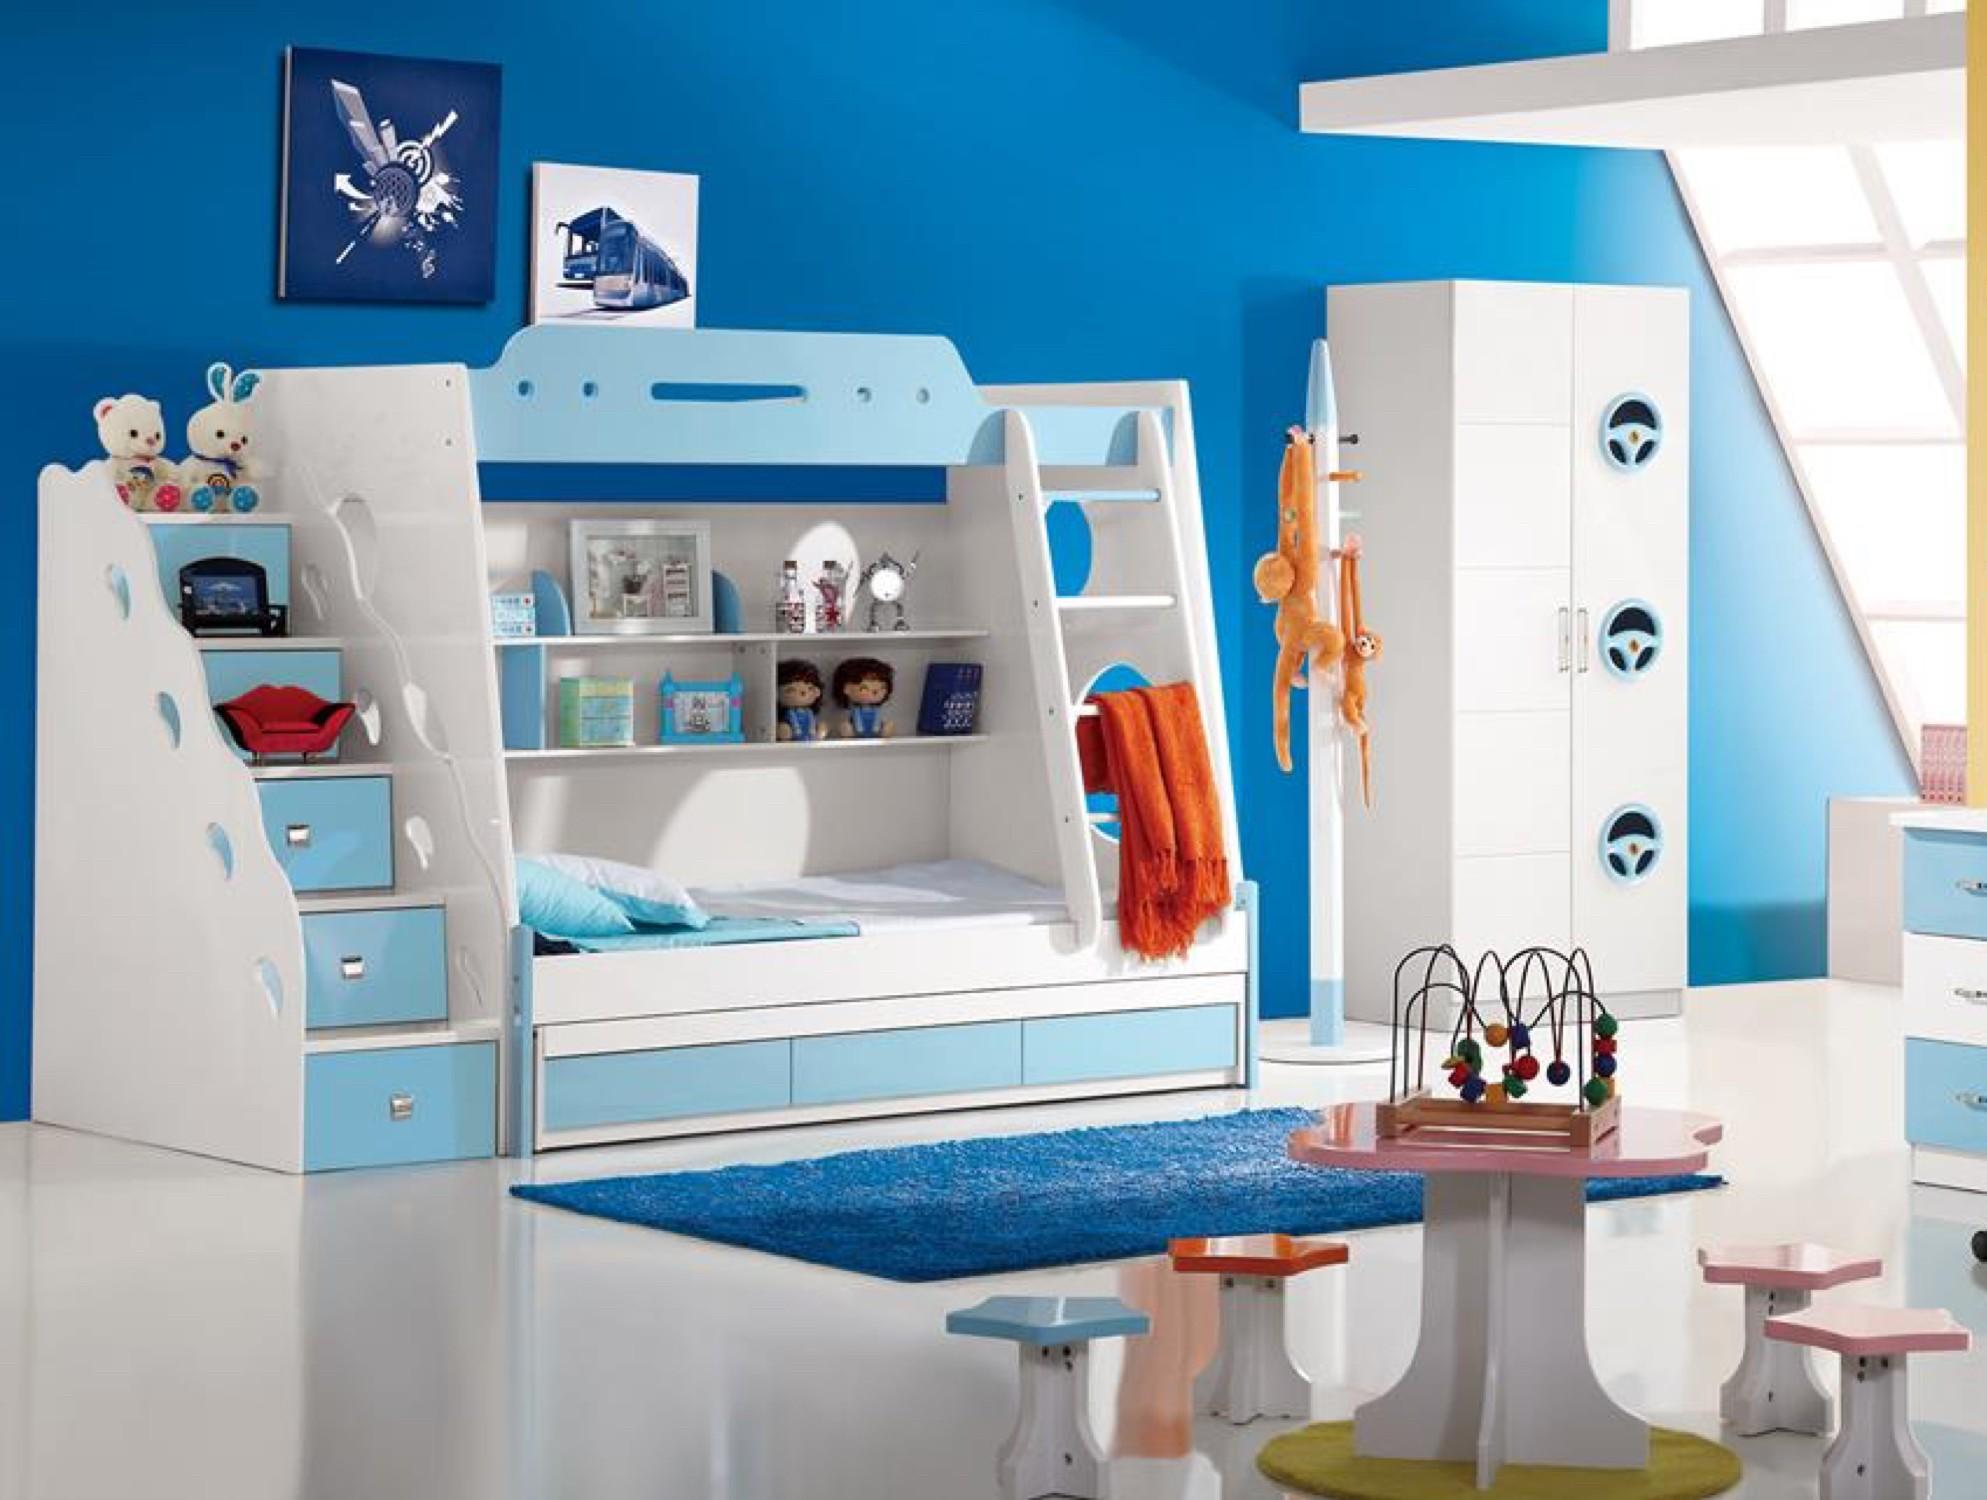 Etagenbett Für Jungs : Etagenbett für jungs etagenbetten fur teenager jungen